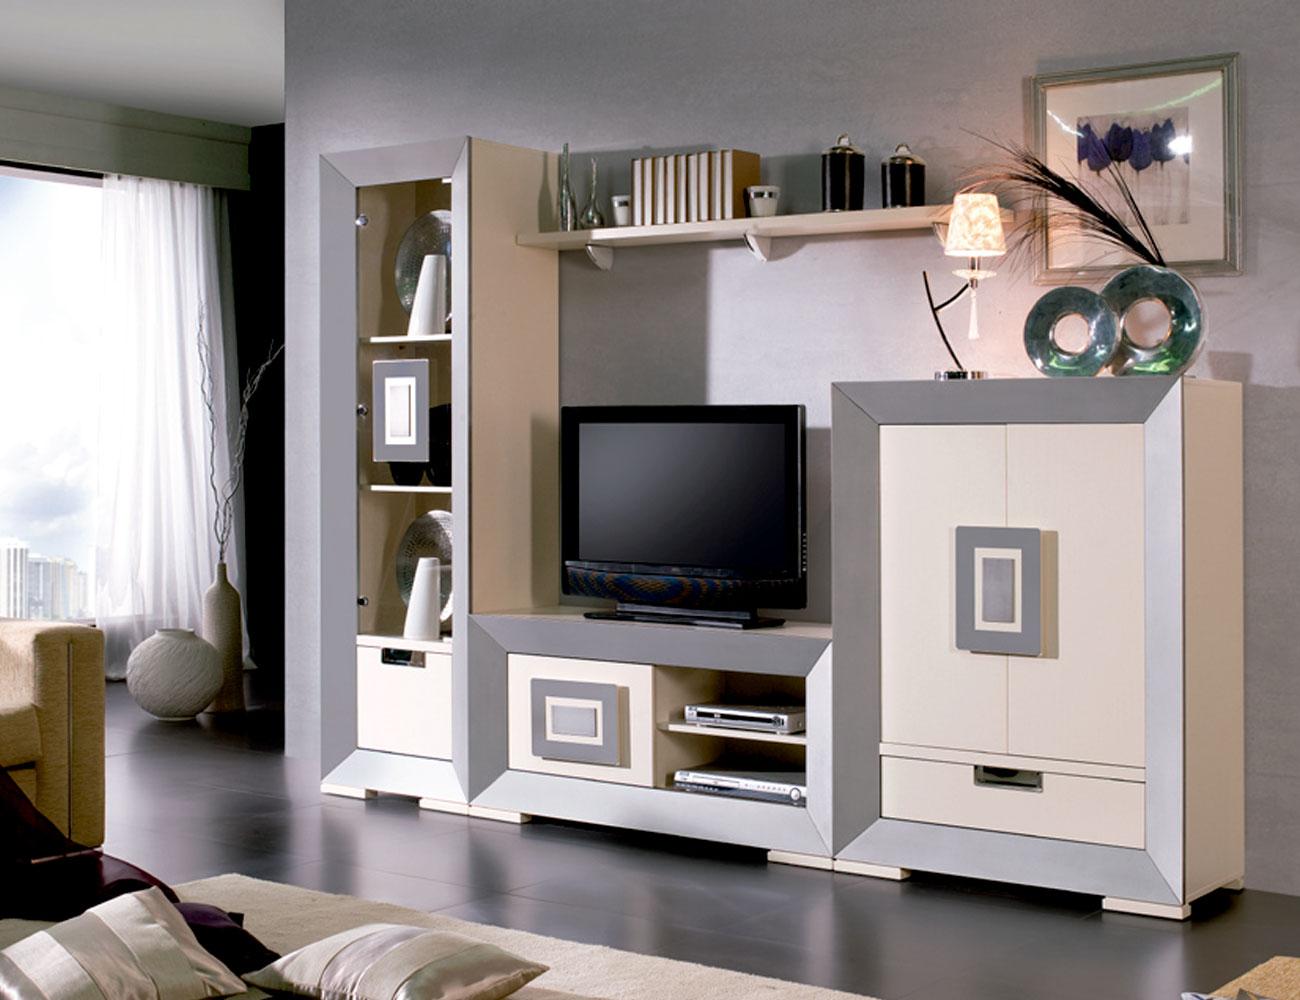 Mueble salon neoclasico color 504 503 tirador acero1